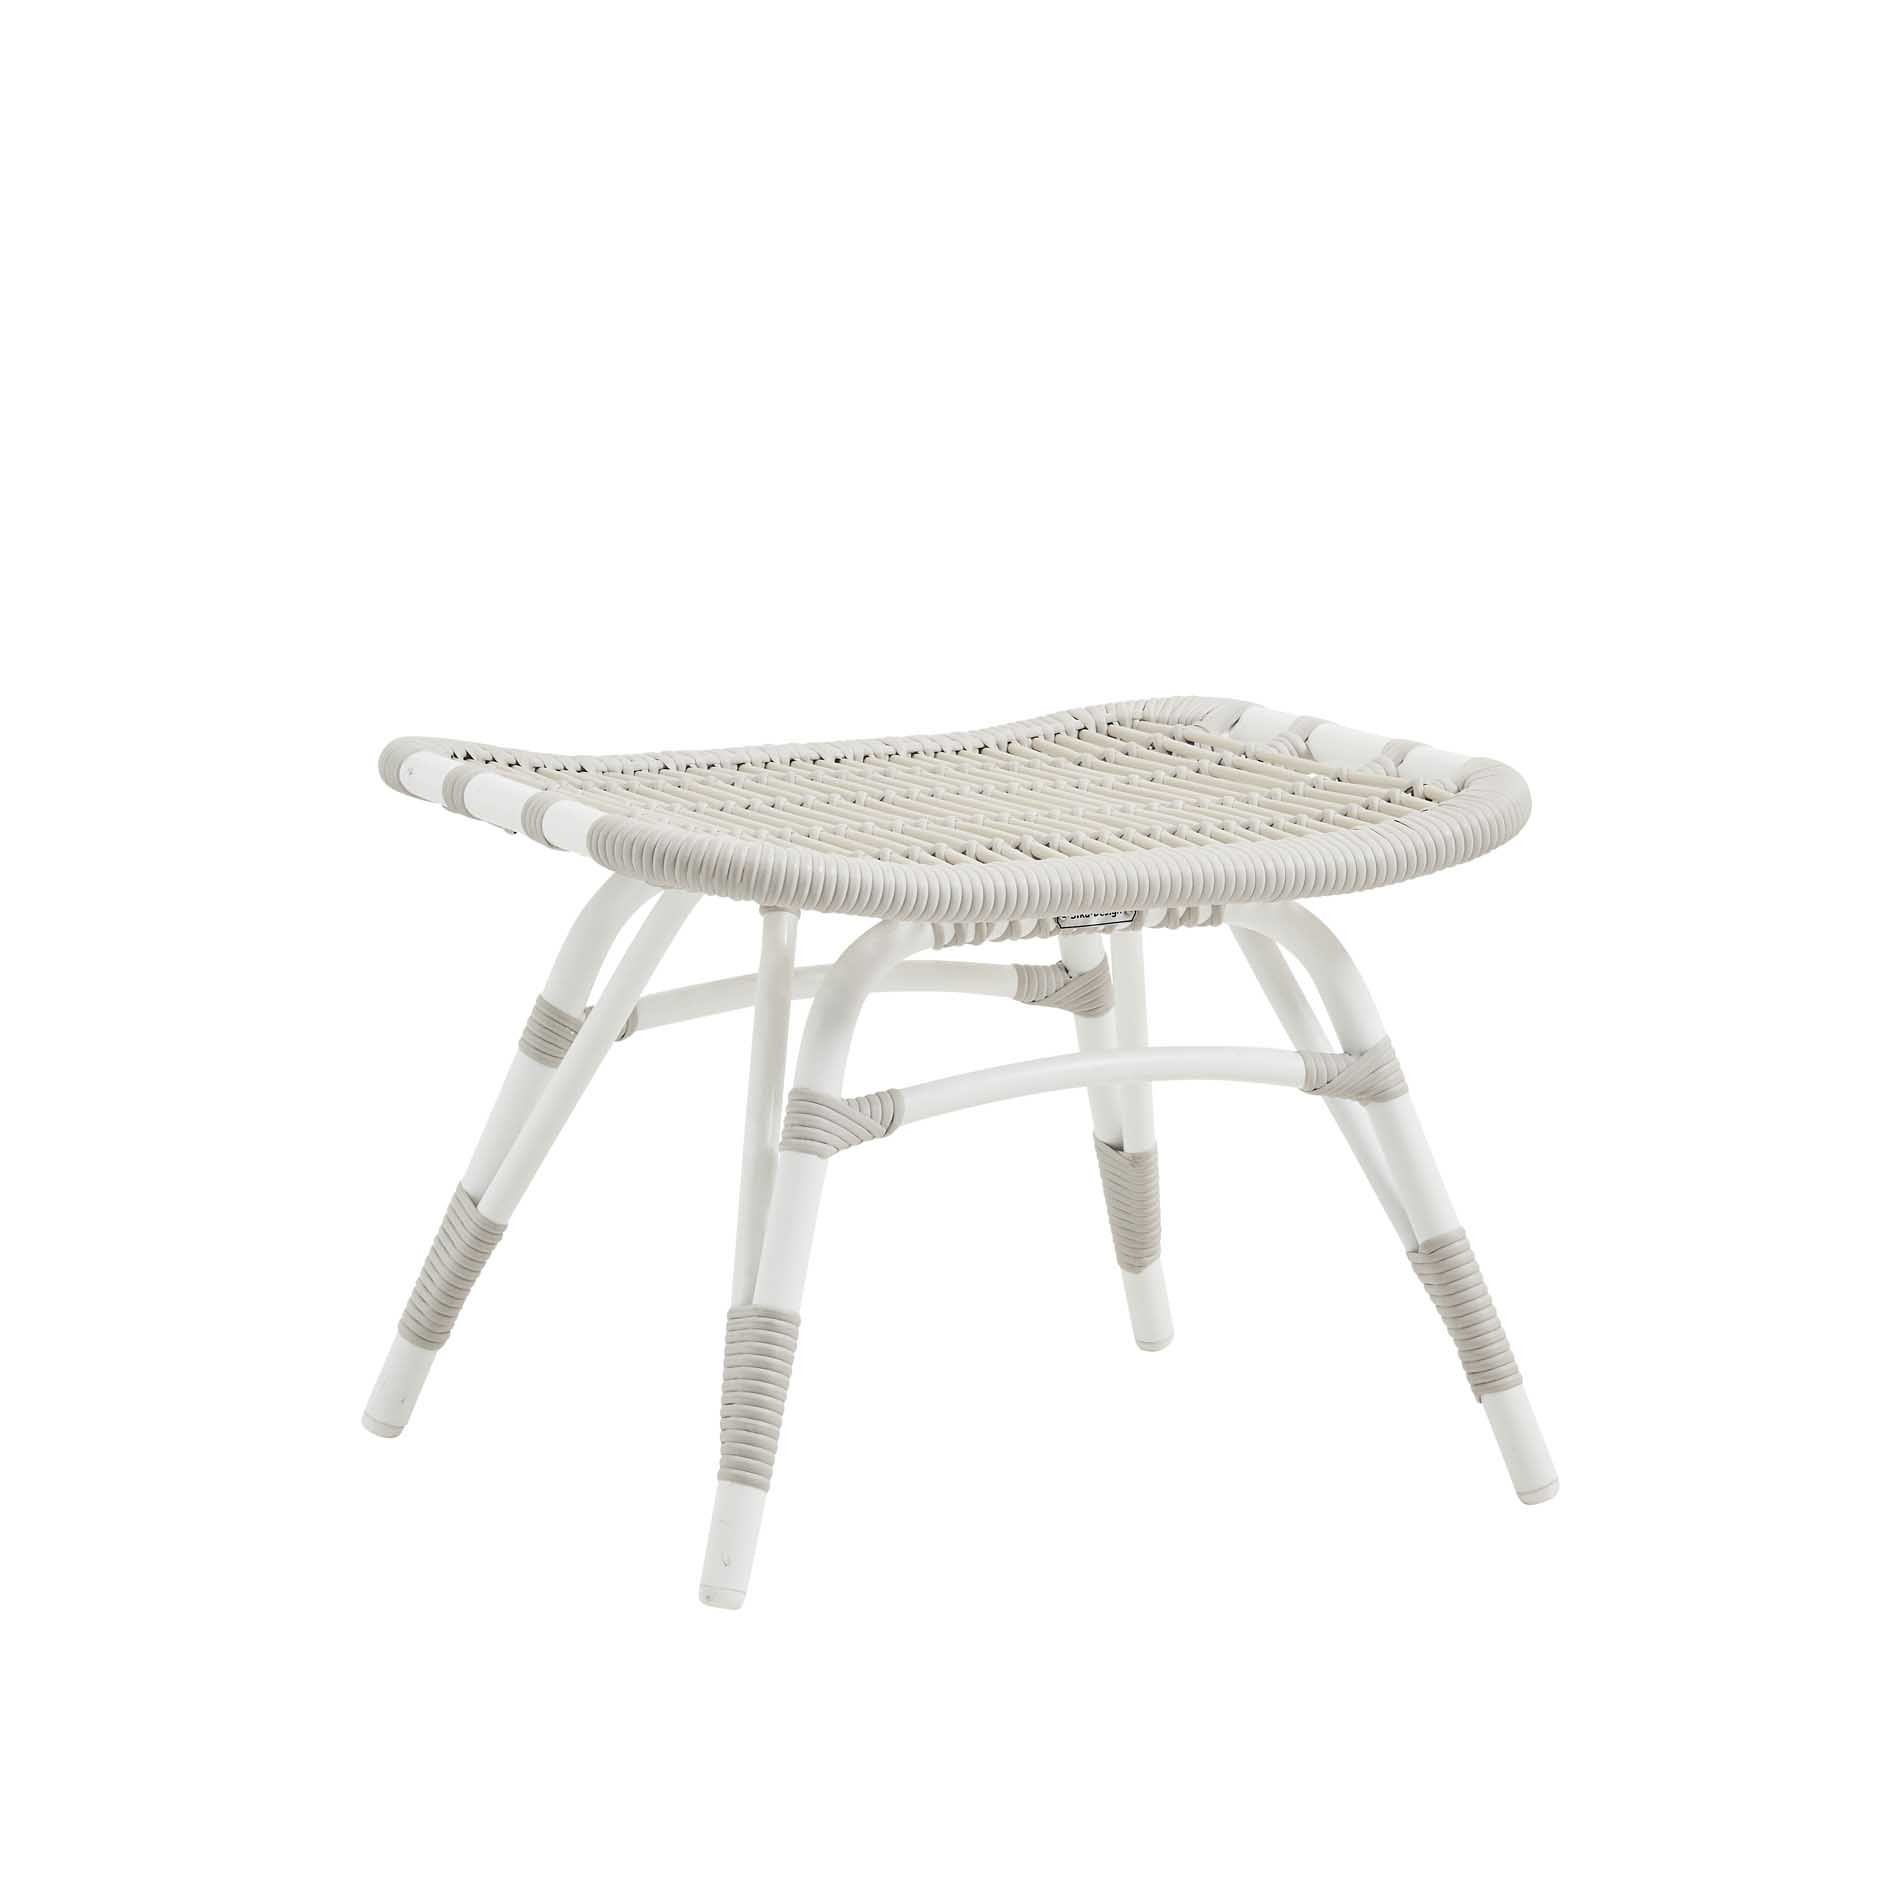 Repose-pieds en aluminium et fibre synthétique blanc